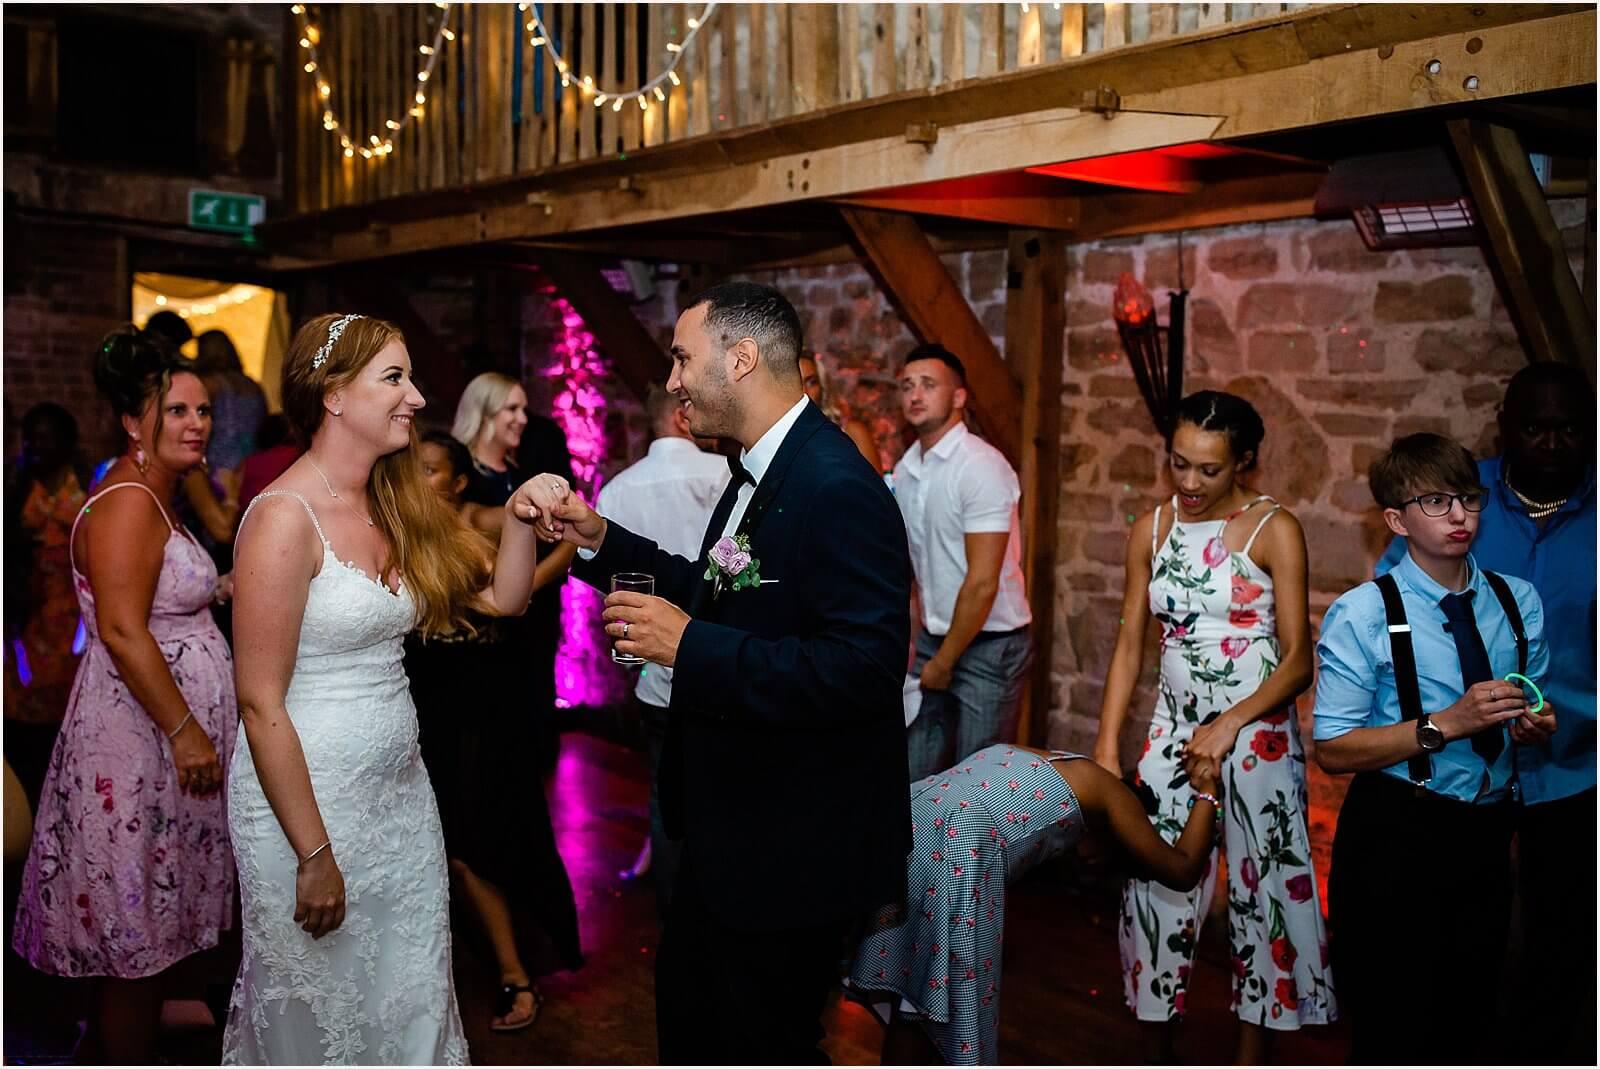 Swallows Oast Wedding - Jakki + Luke's barn wedding photography 66